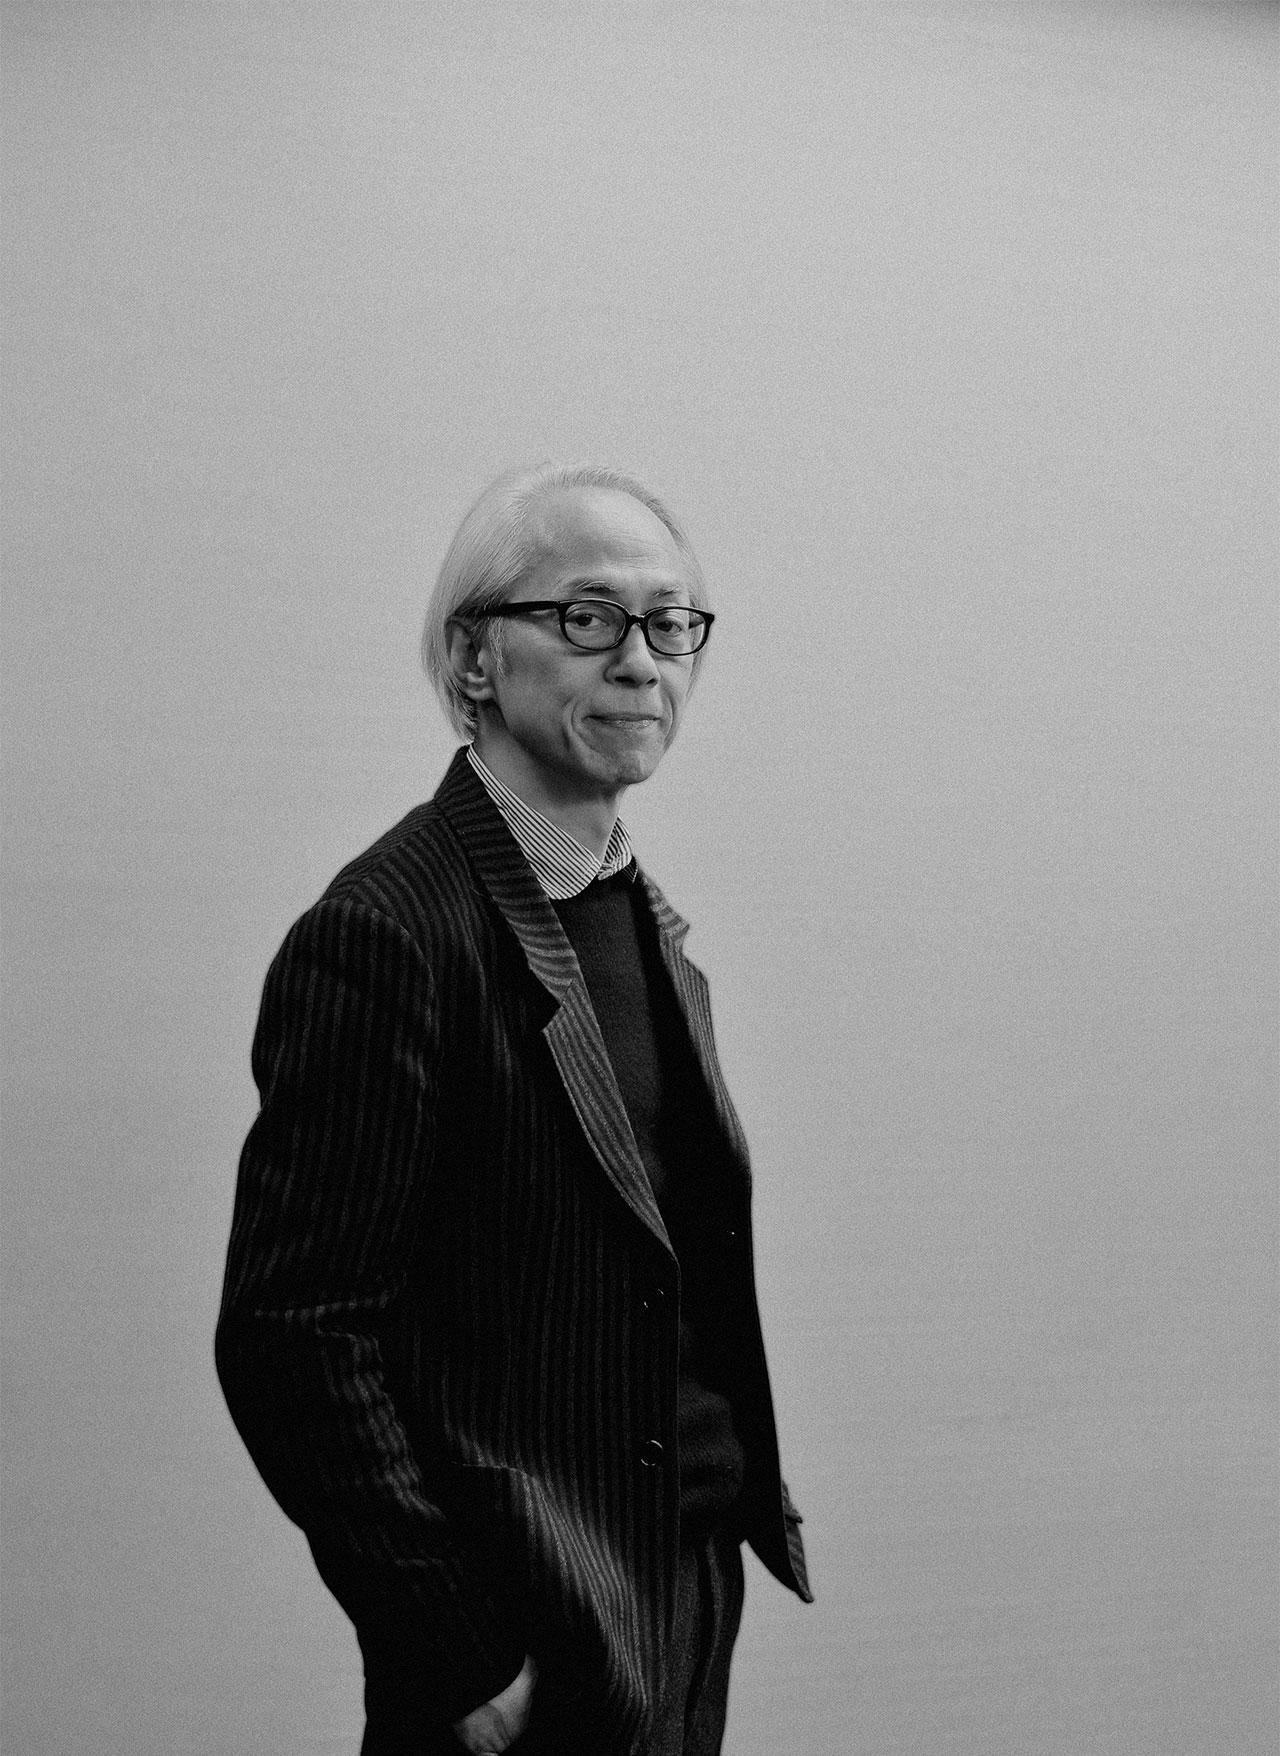 Photo by Hidemasa Miyake | © The Fashion Post